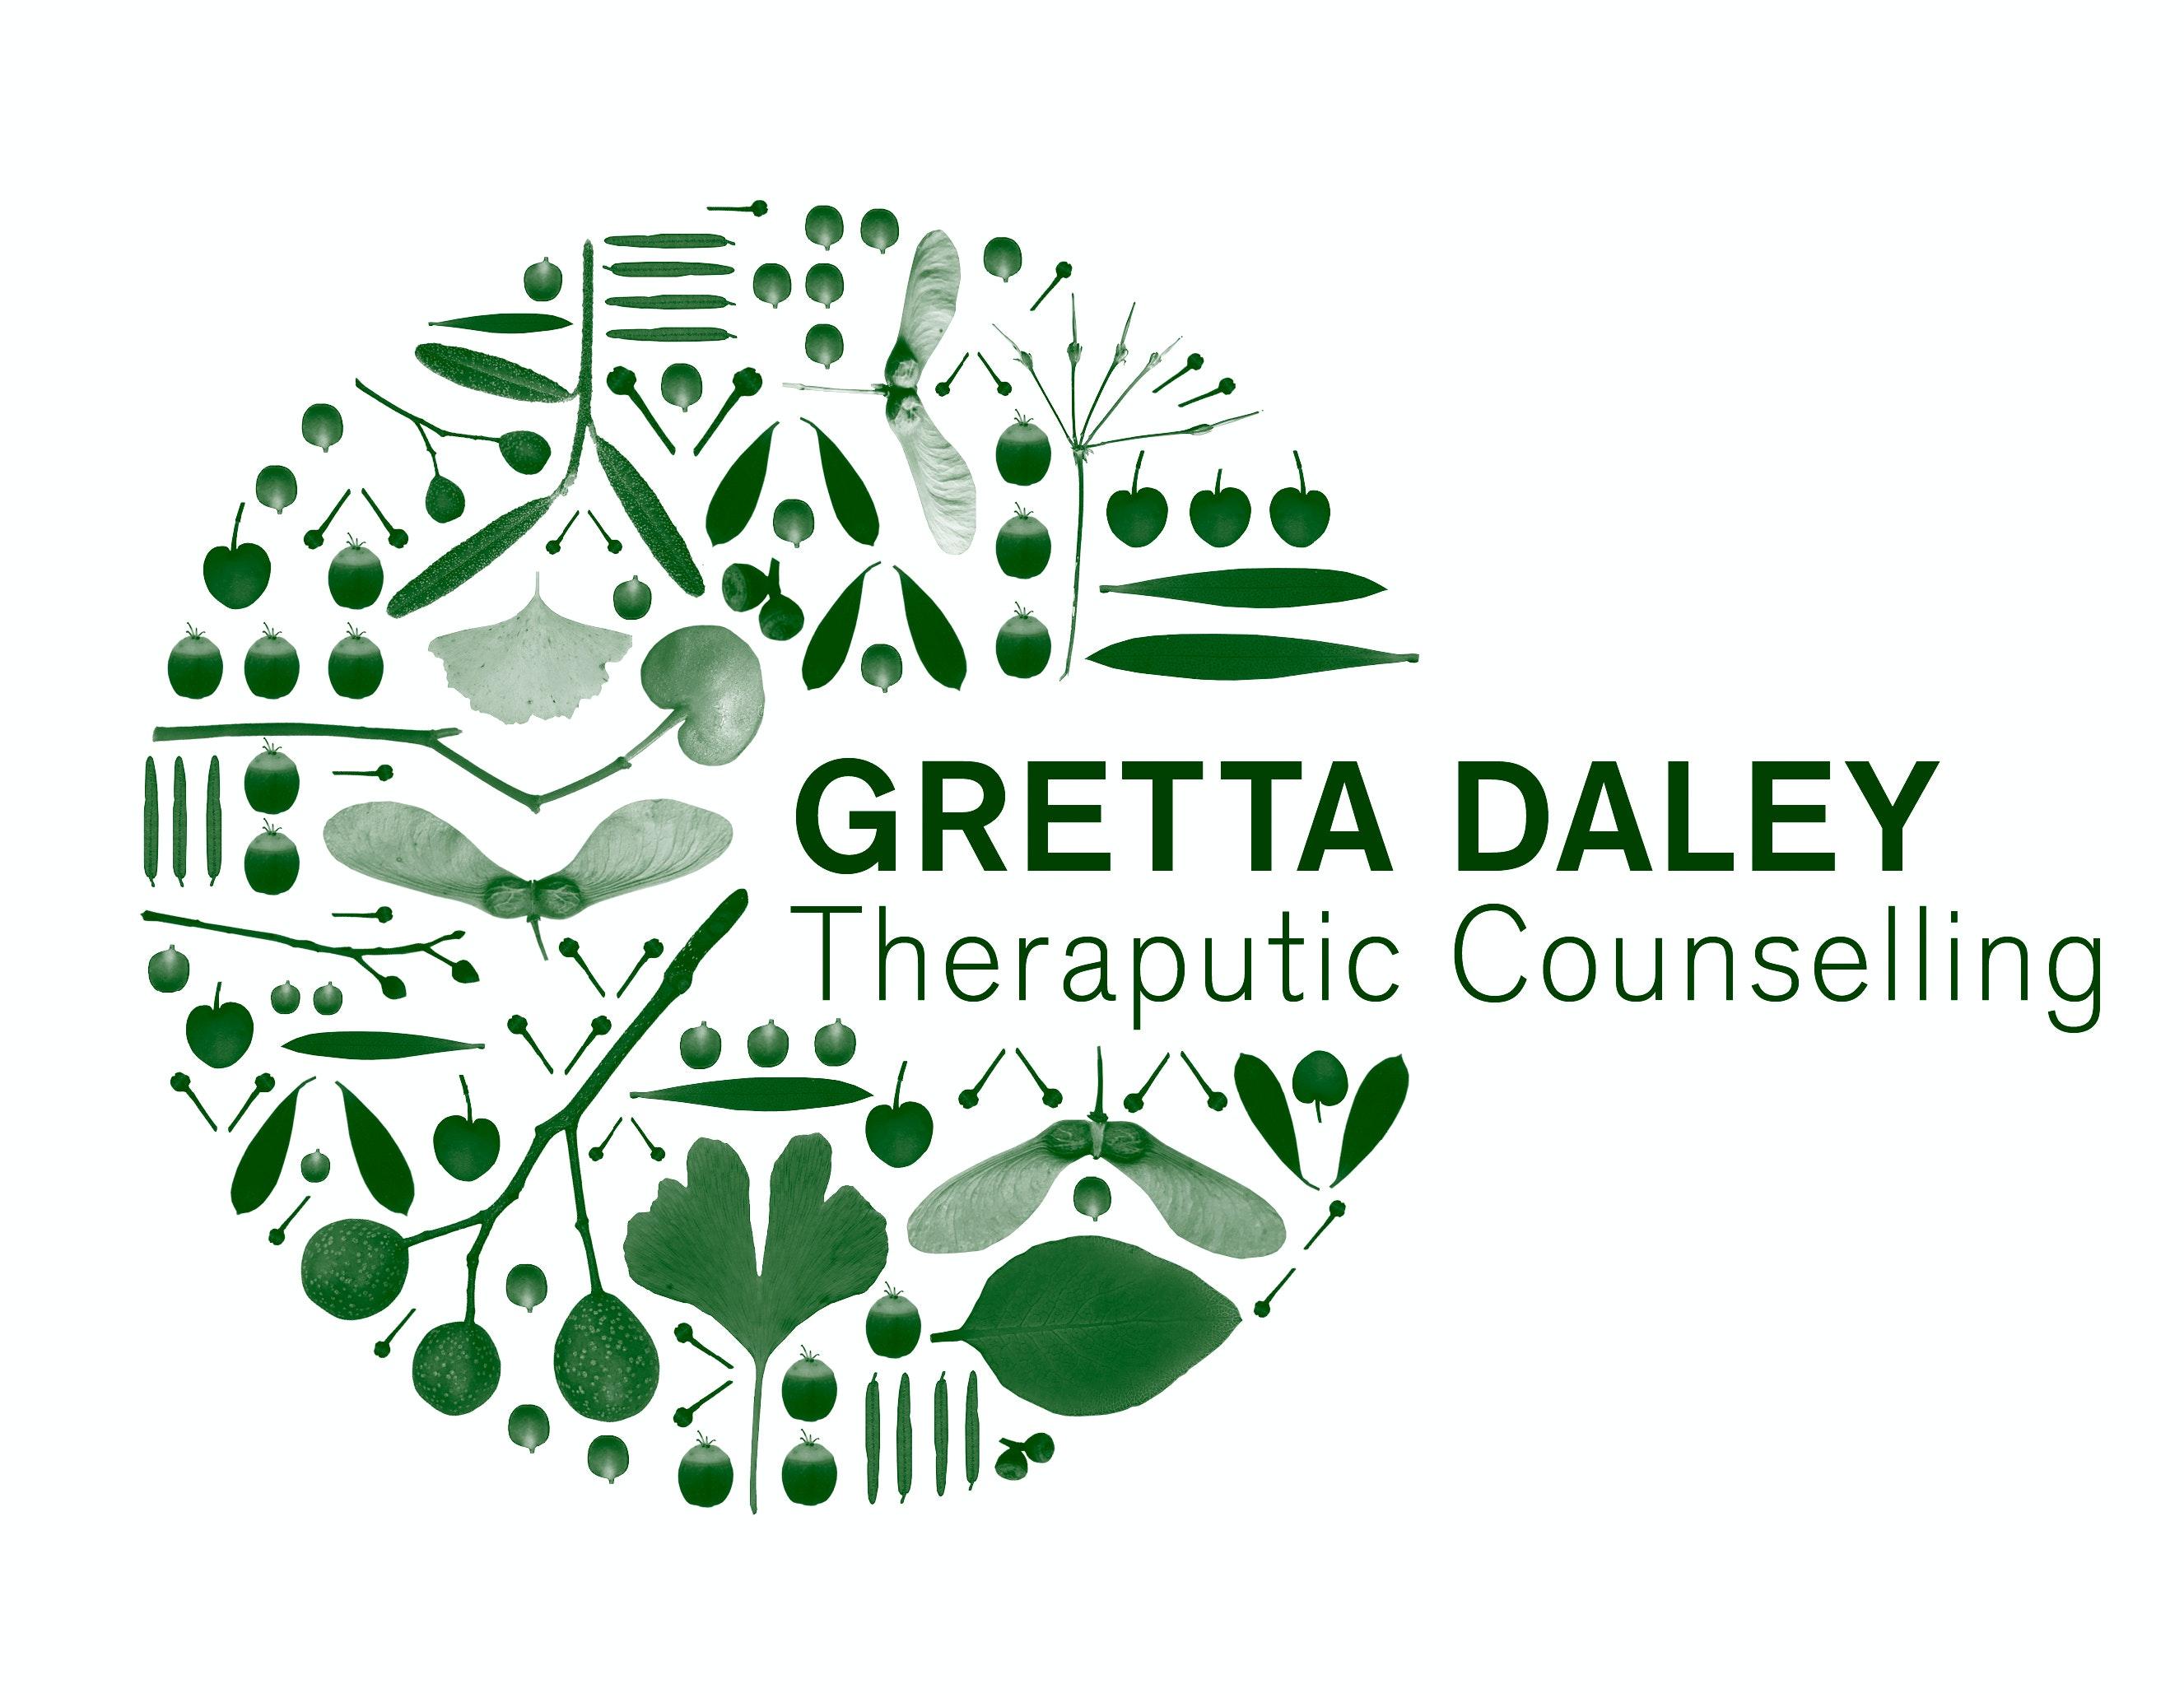 Gretta Daley Therapeutic Counselling